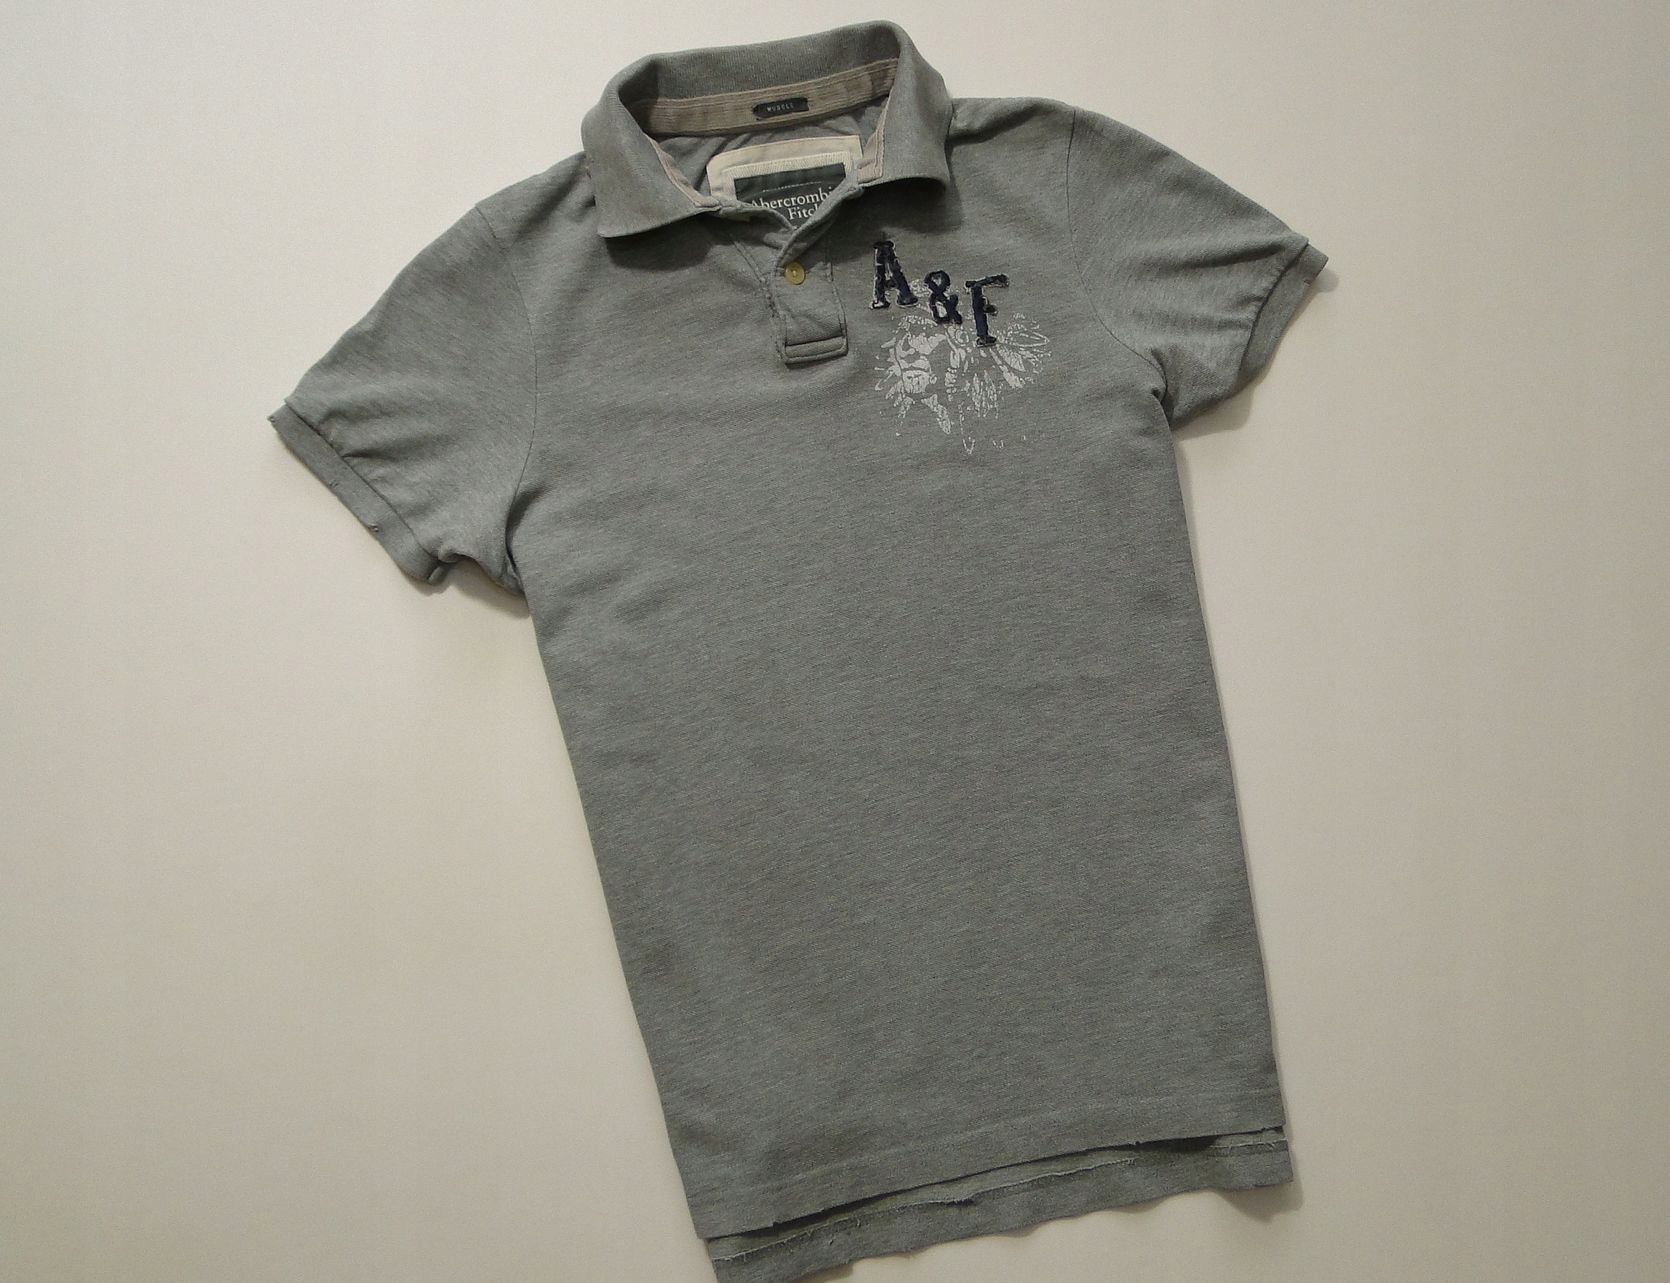 Koszulka Abercrombie Fitch Muscle New York Polo